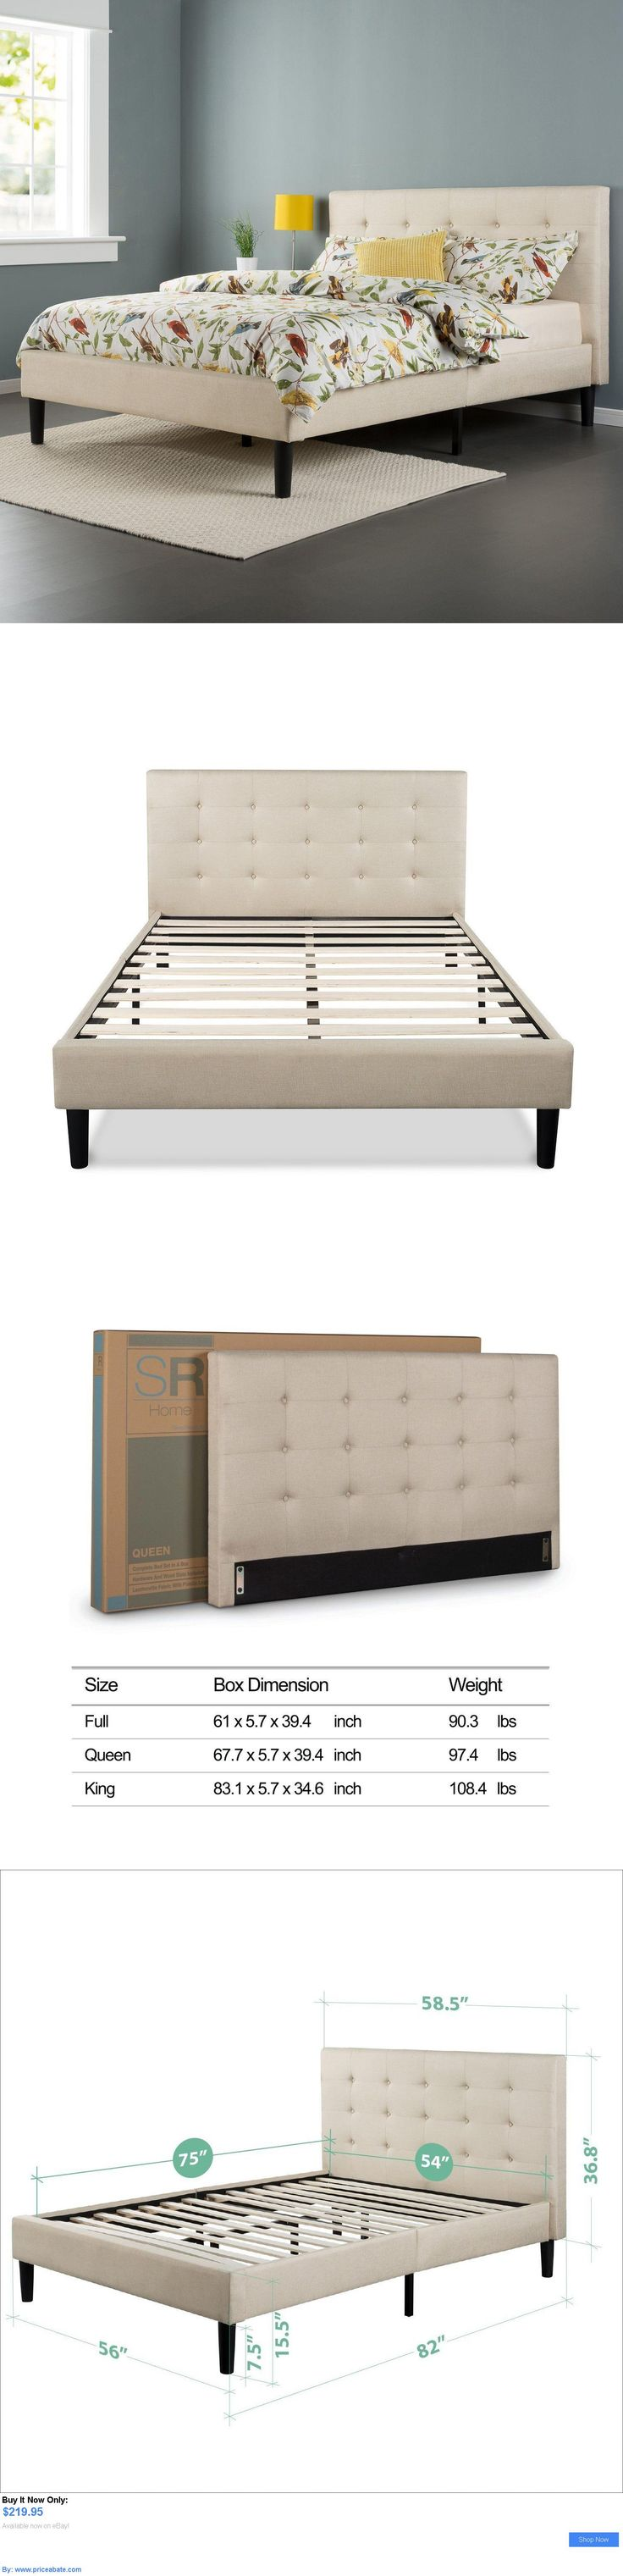 Bedding: Upholstered Bed Frame Queen Full King Size Platform Mattress Bedroom Headboard BUY IT NOW ONLY: $219.95 #priceabateBedding OR #priceabate